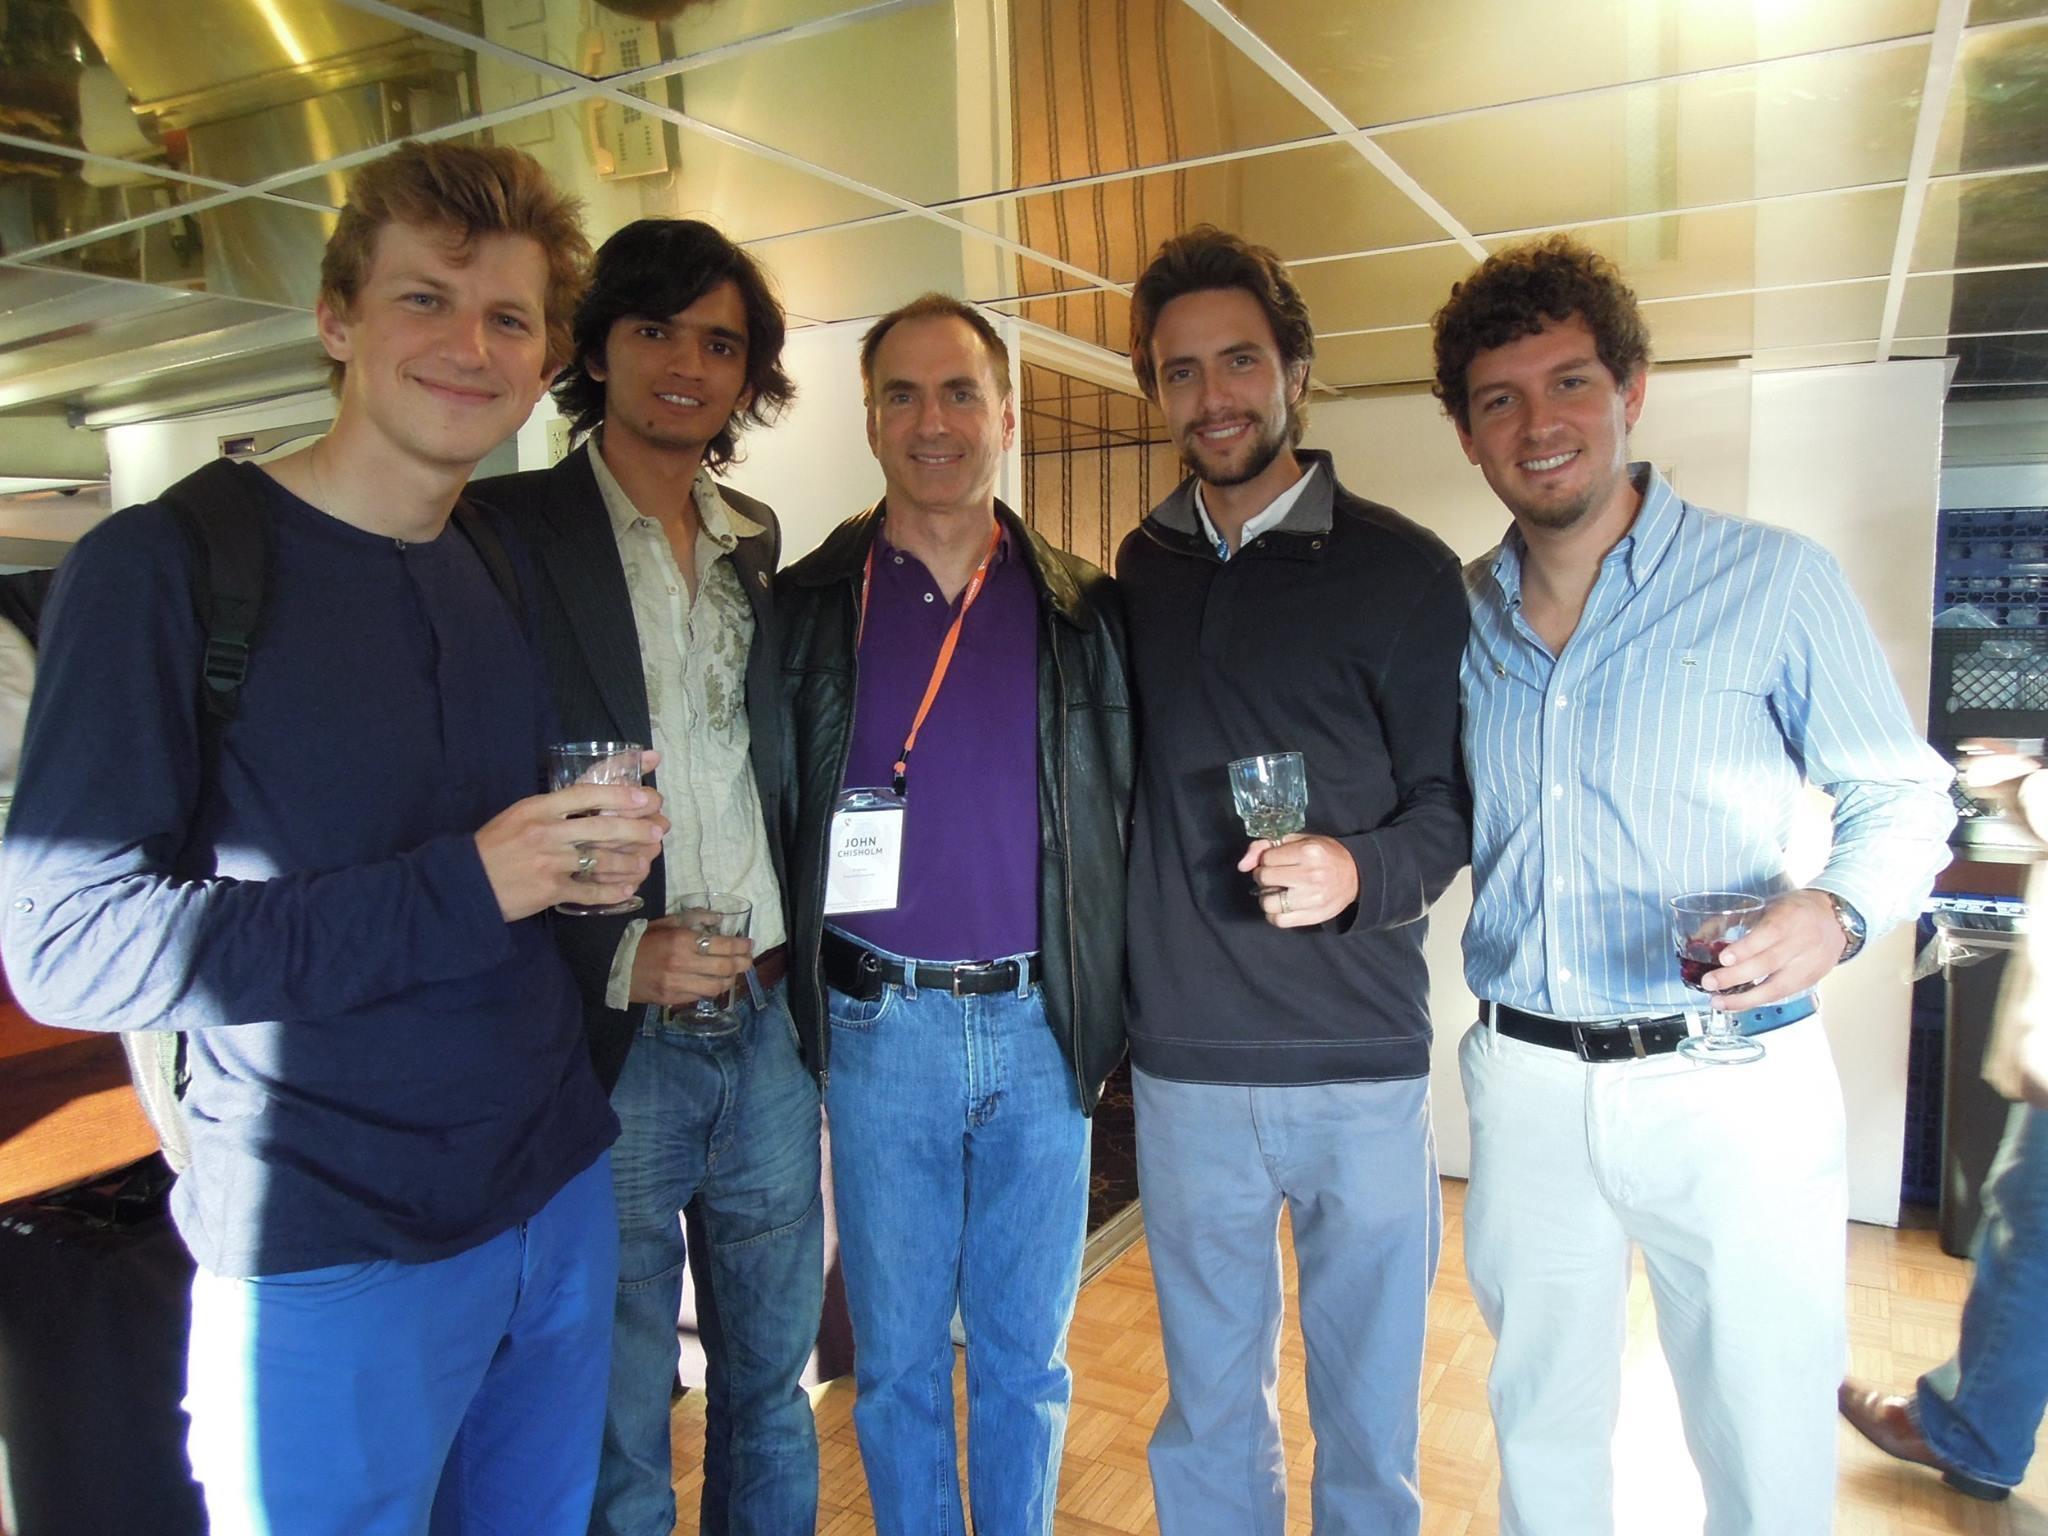 Menshenin and his Singularity University team with John Chisholm, a trustee and former president/chair of the worldwide alumni association of MIT. Photo: Yaroslav Menshenin // Skoltech.